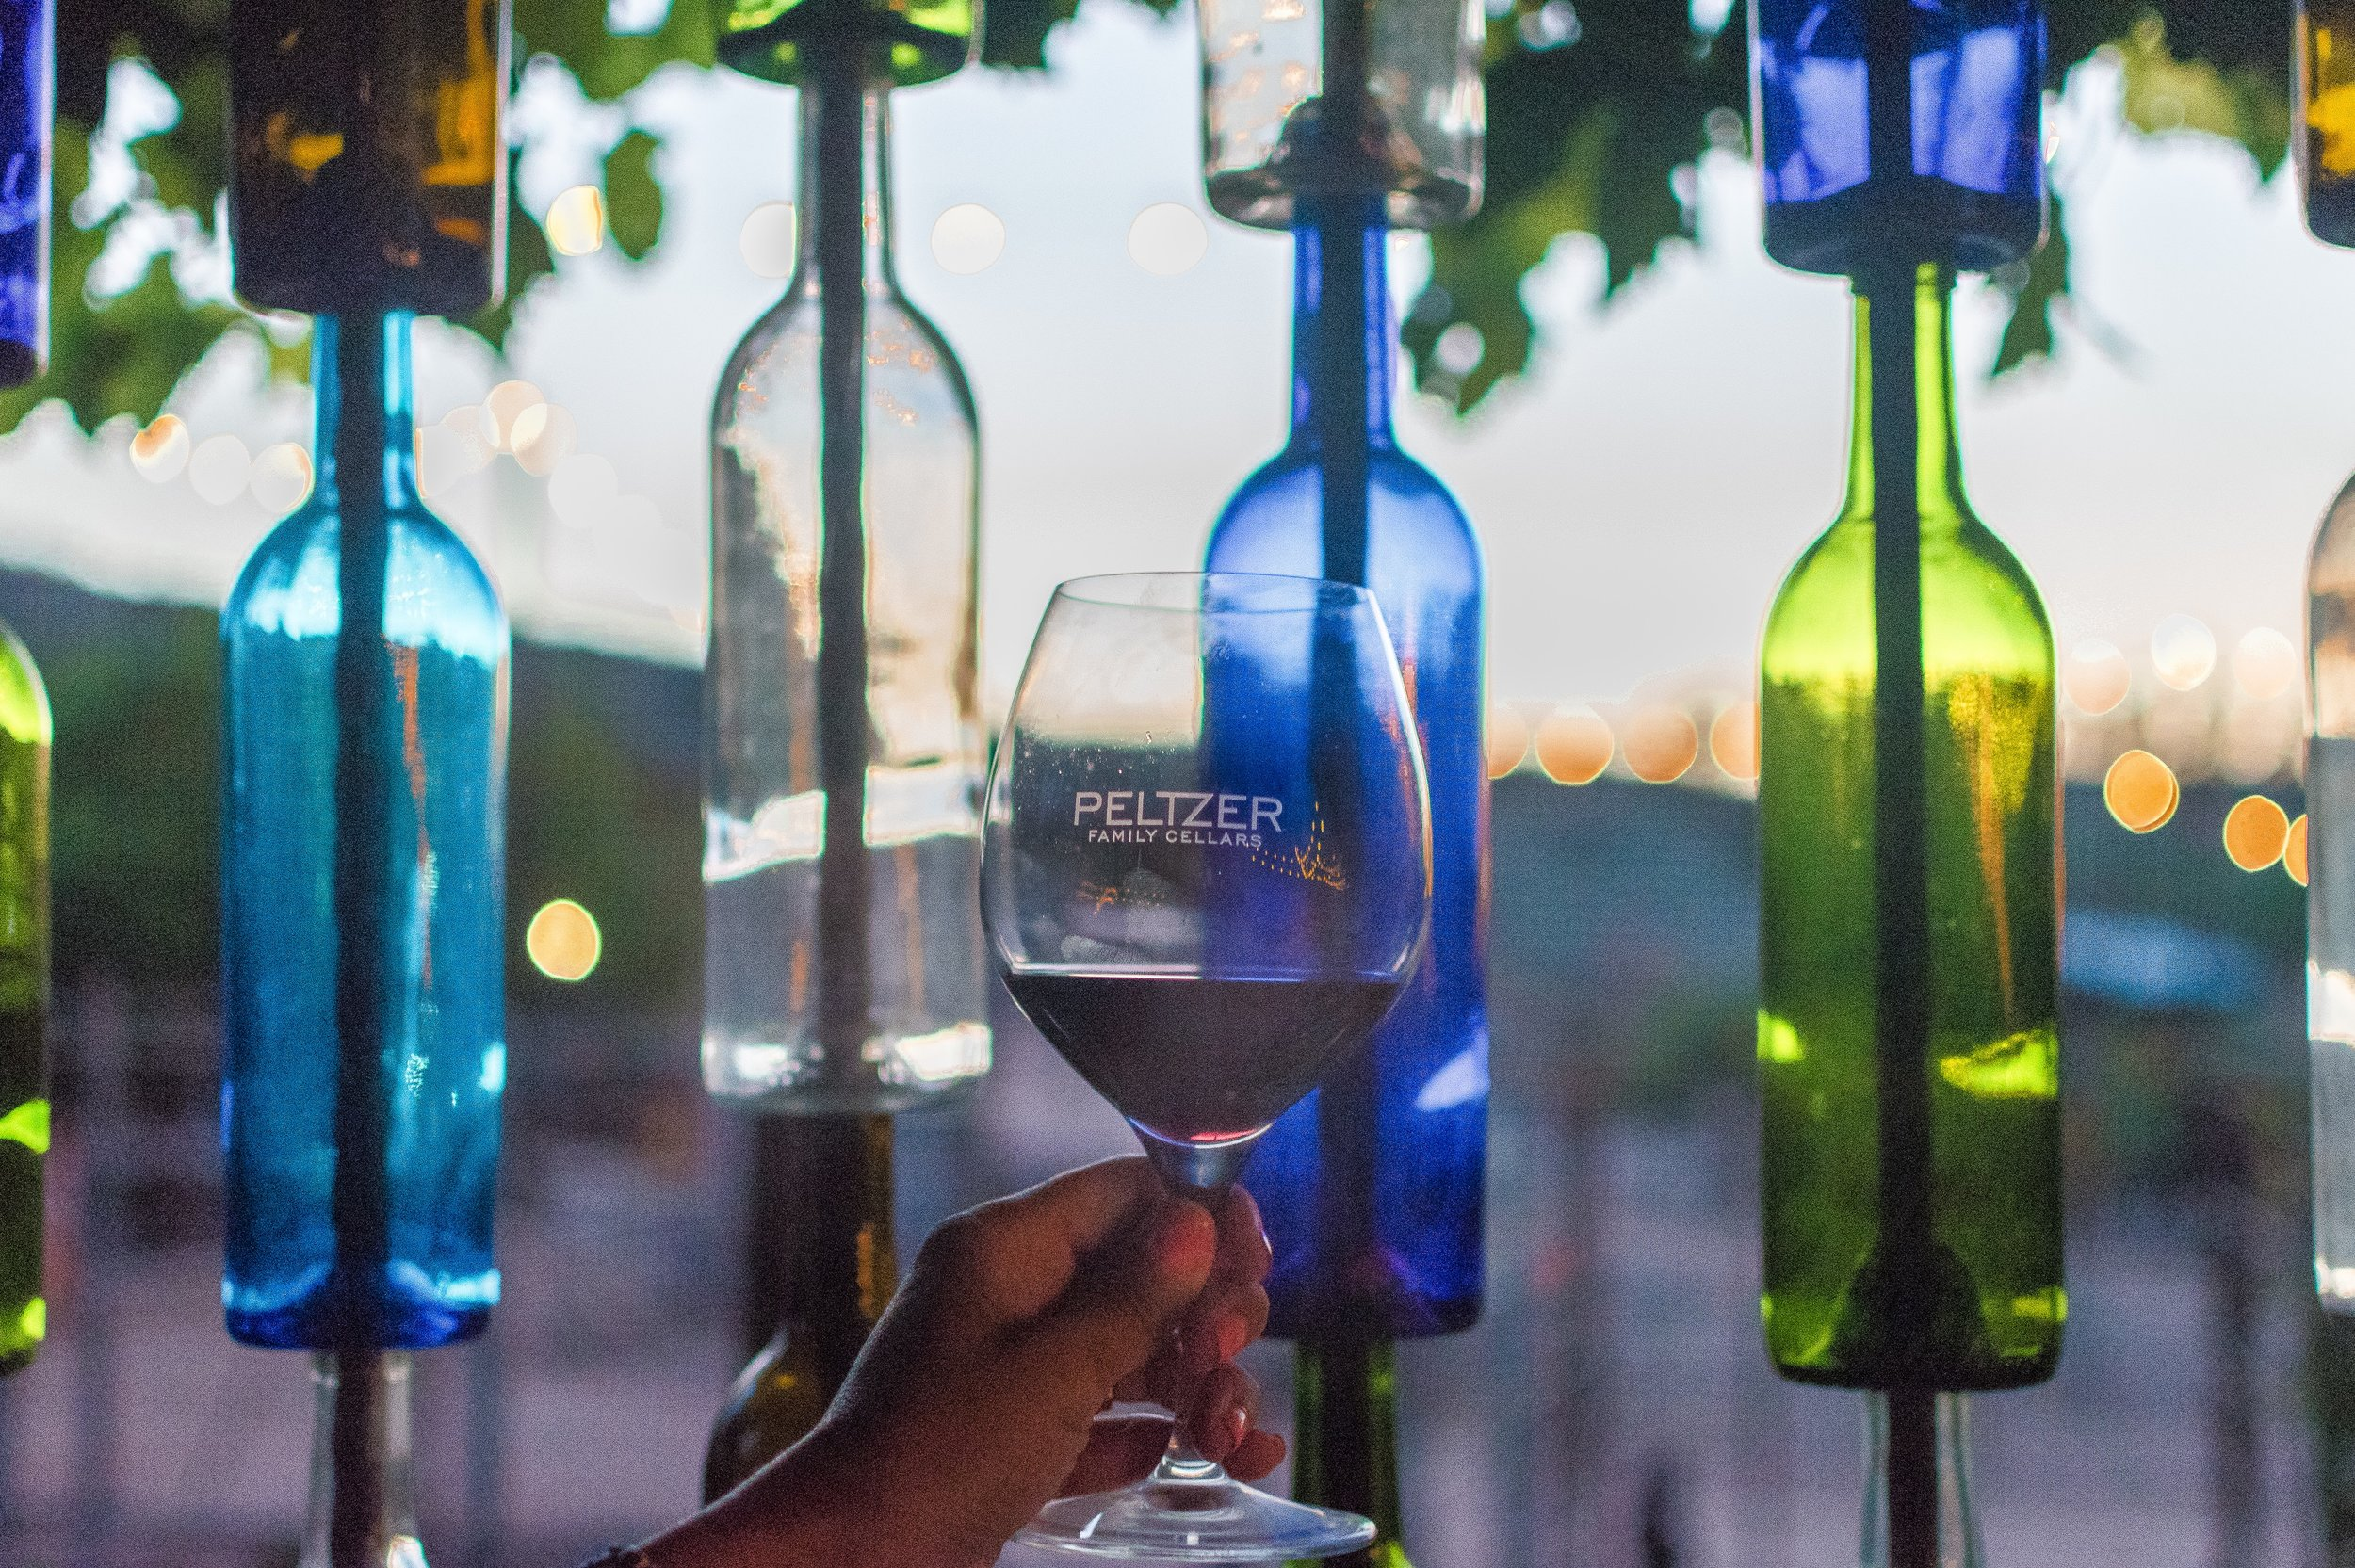 Jimmy Fu Photography at Peltzer Winery